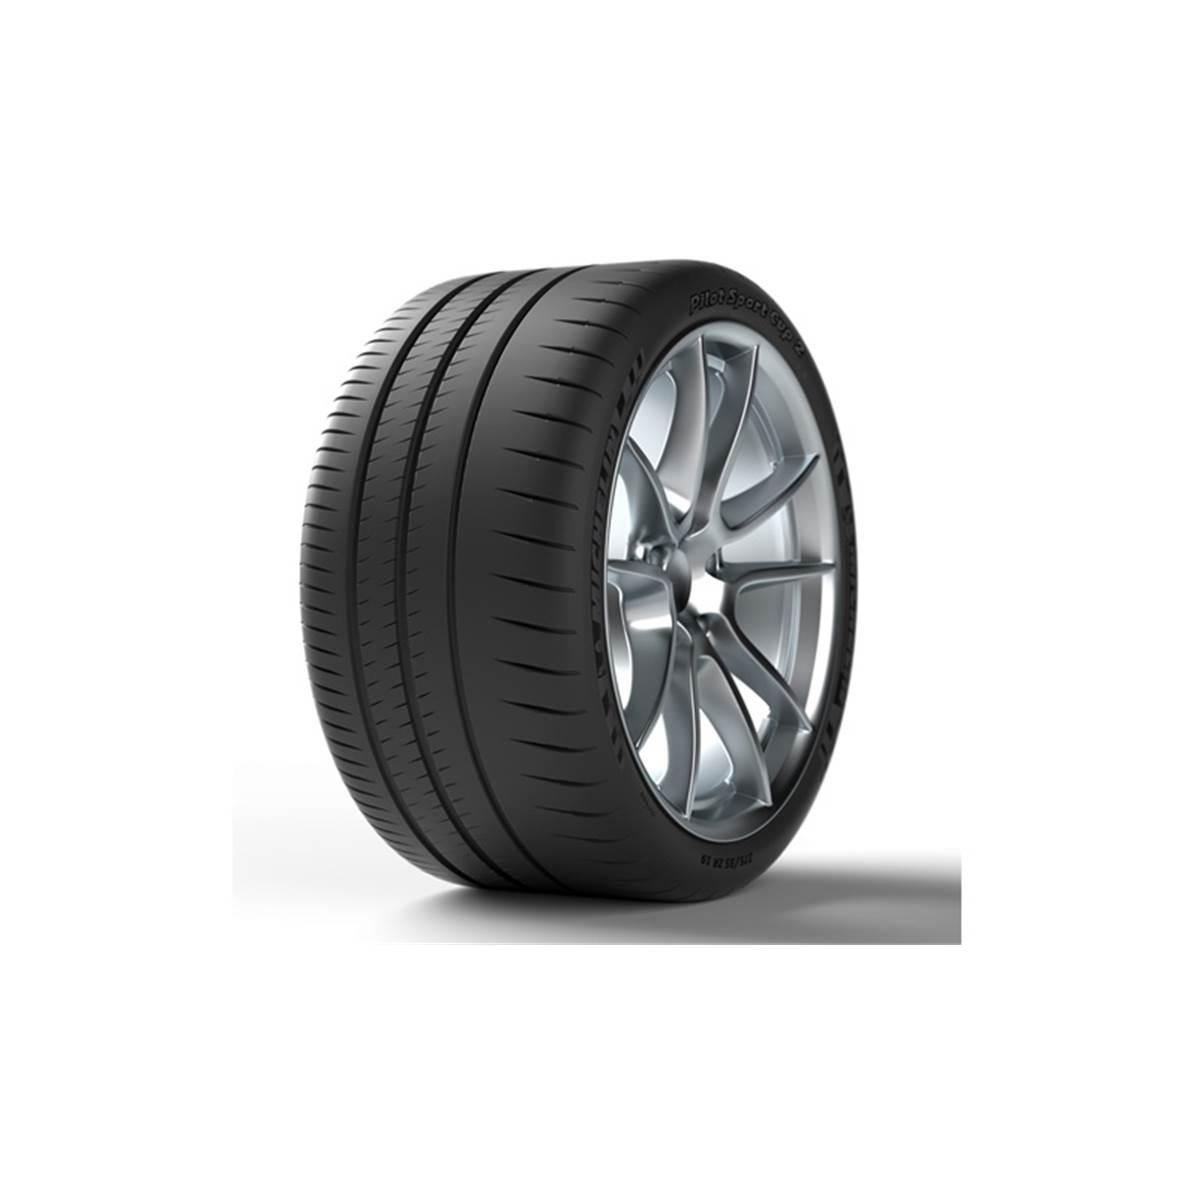 Pneu Michelin 265/35R19 98Y Pilot Sport Cup 2 XL